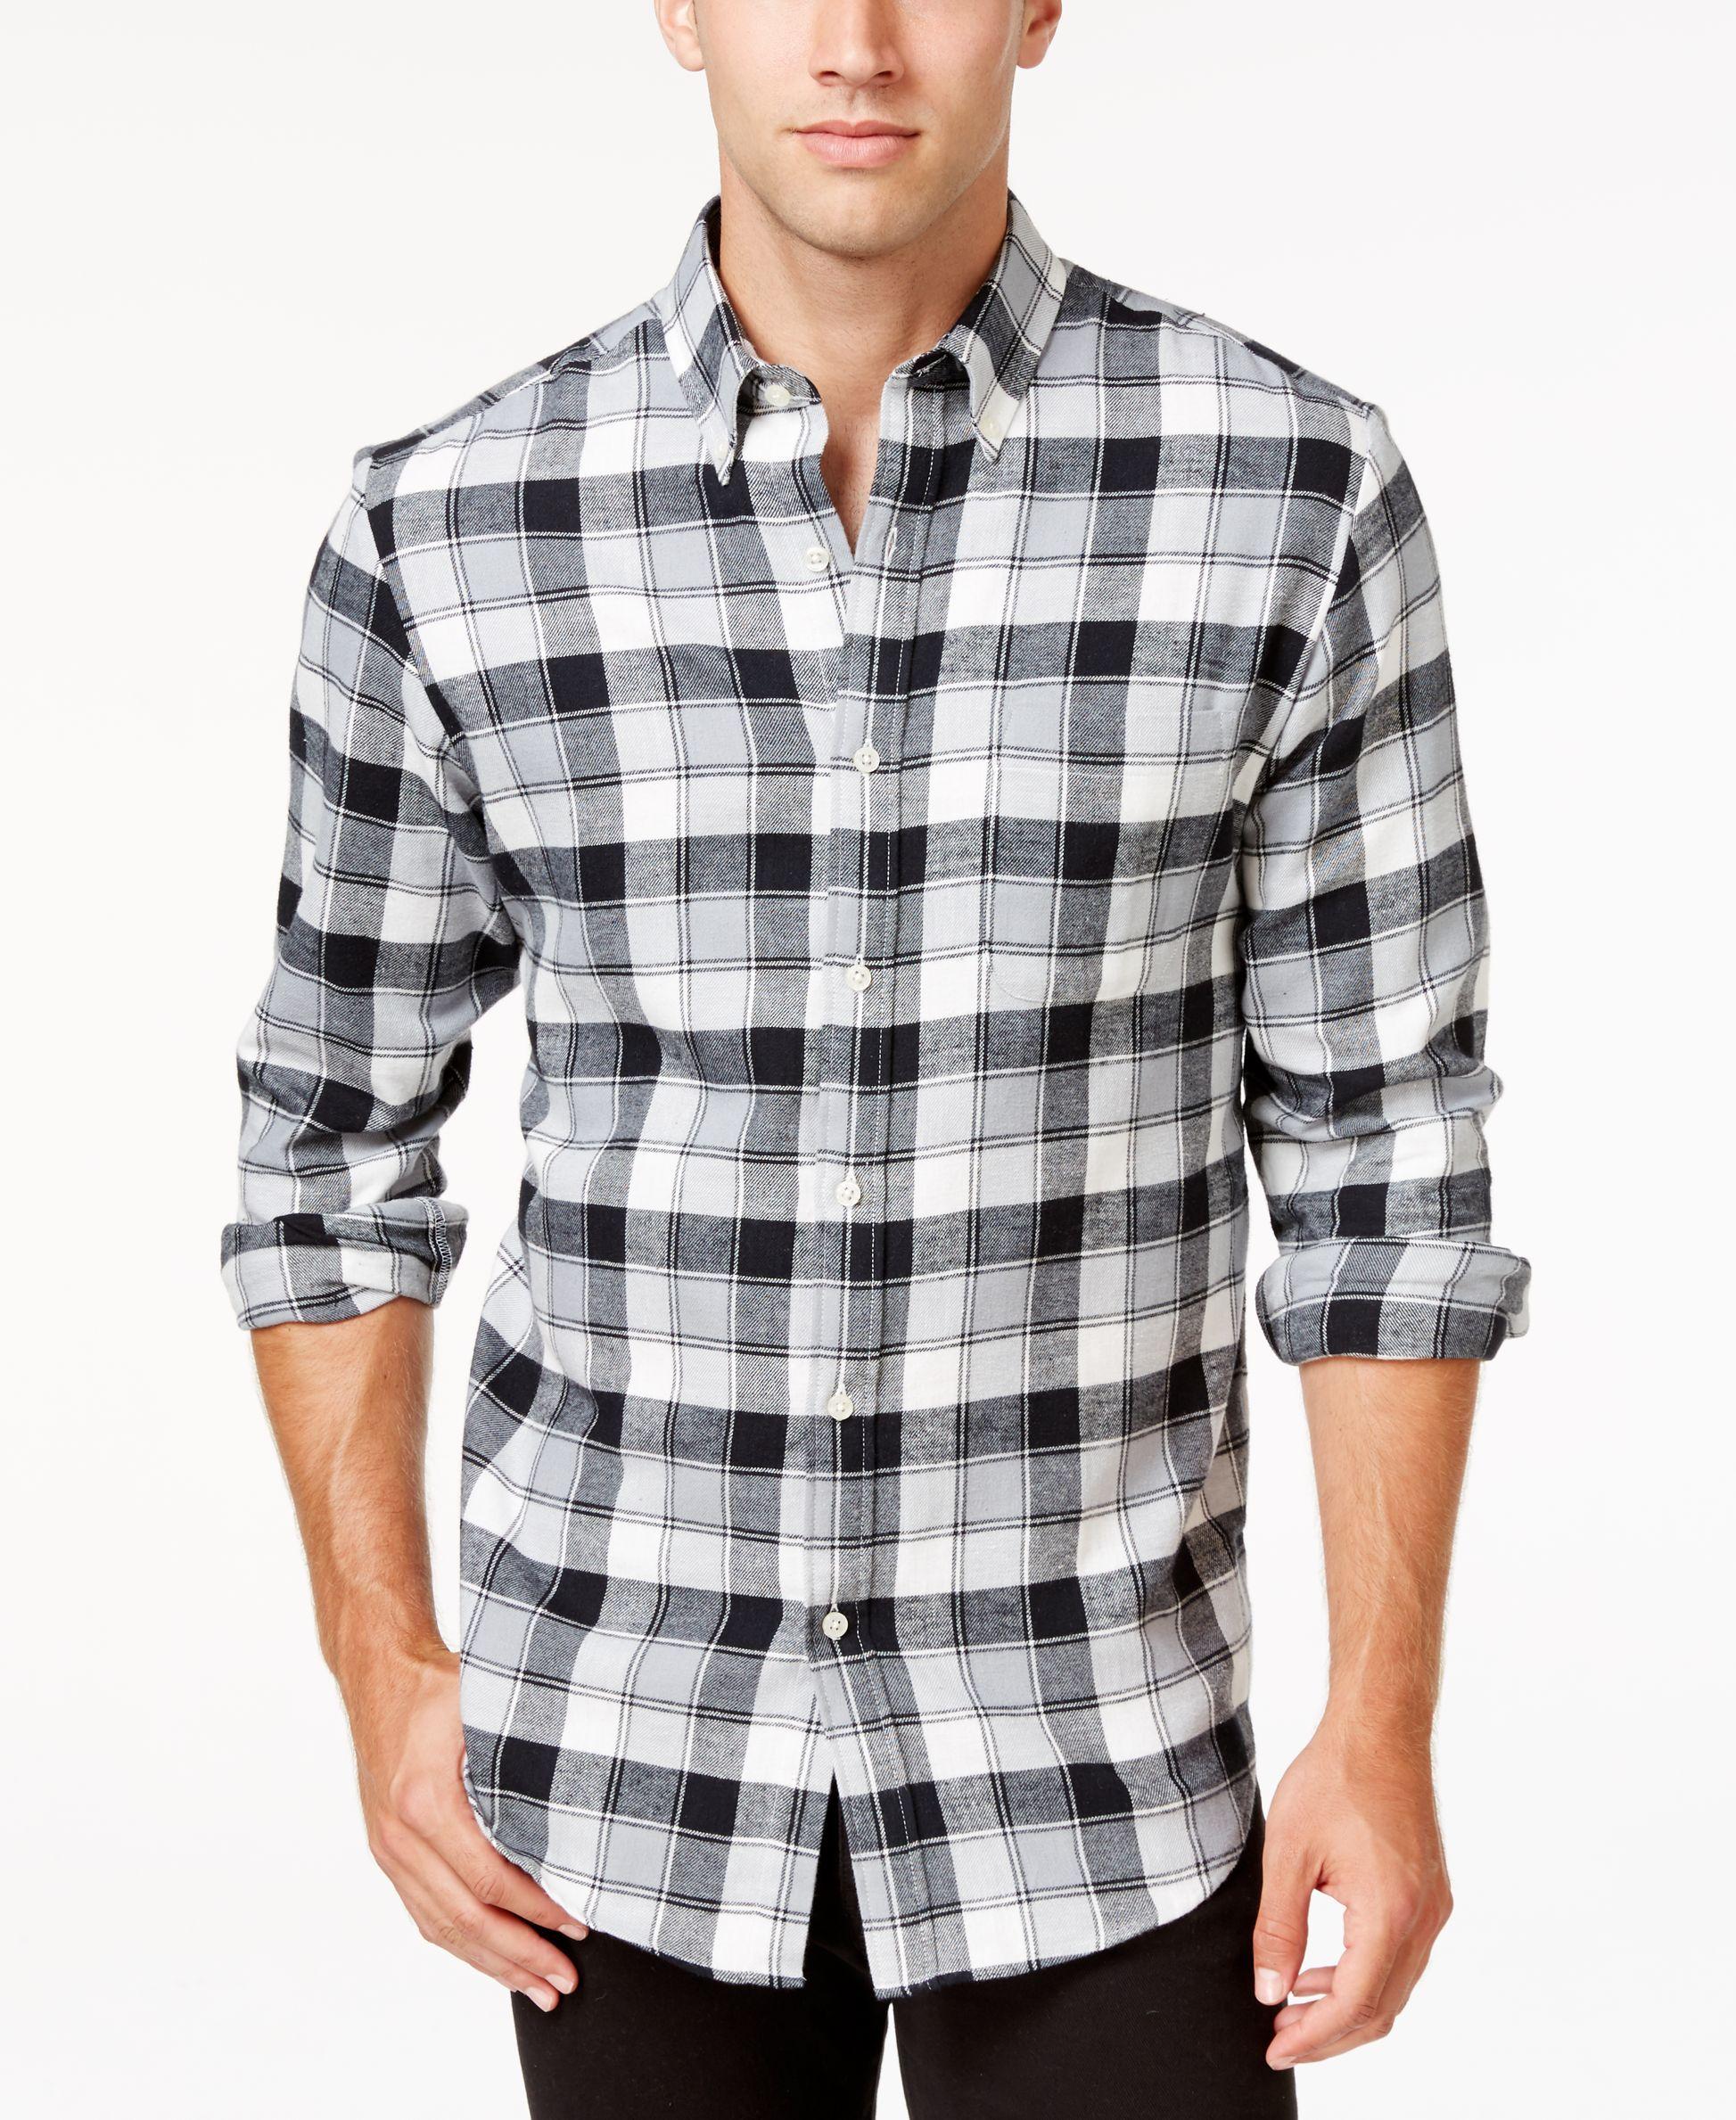 Flannel shirt black and grey  John Ashford Menus Big and Tall LongSleeve Plaid Shirt Only at